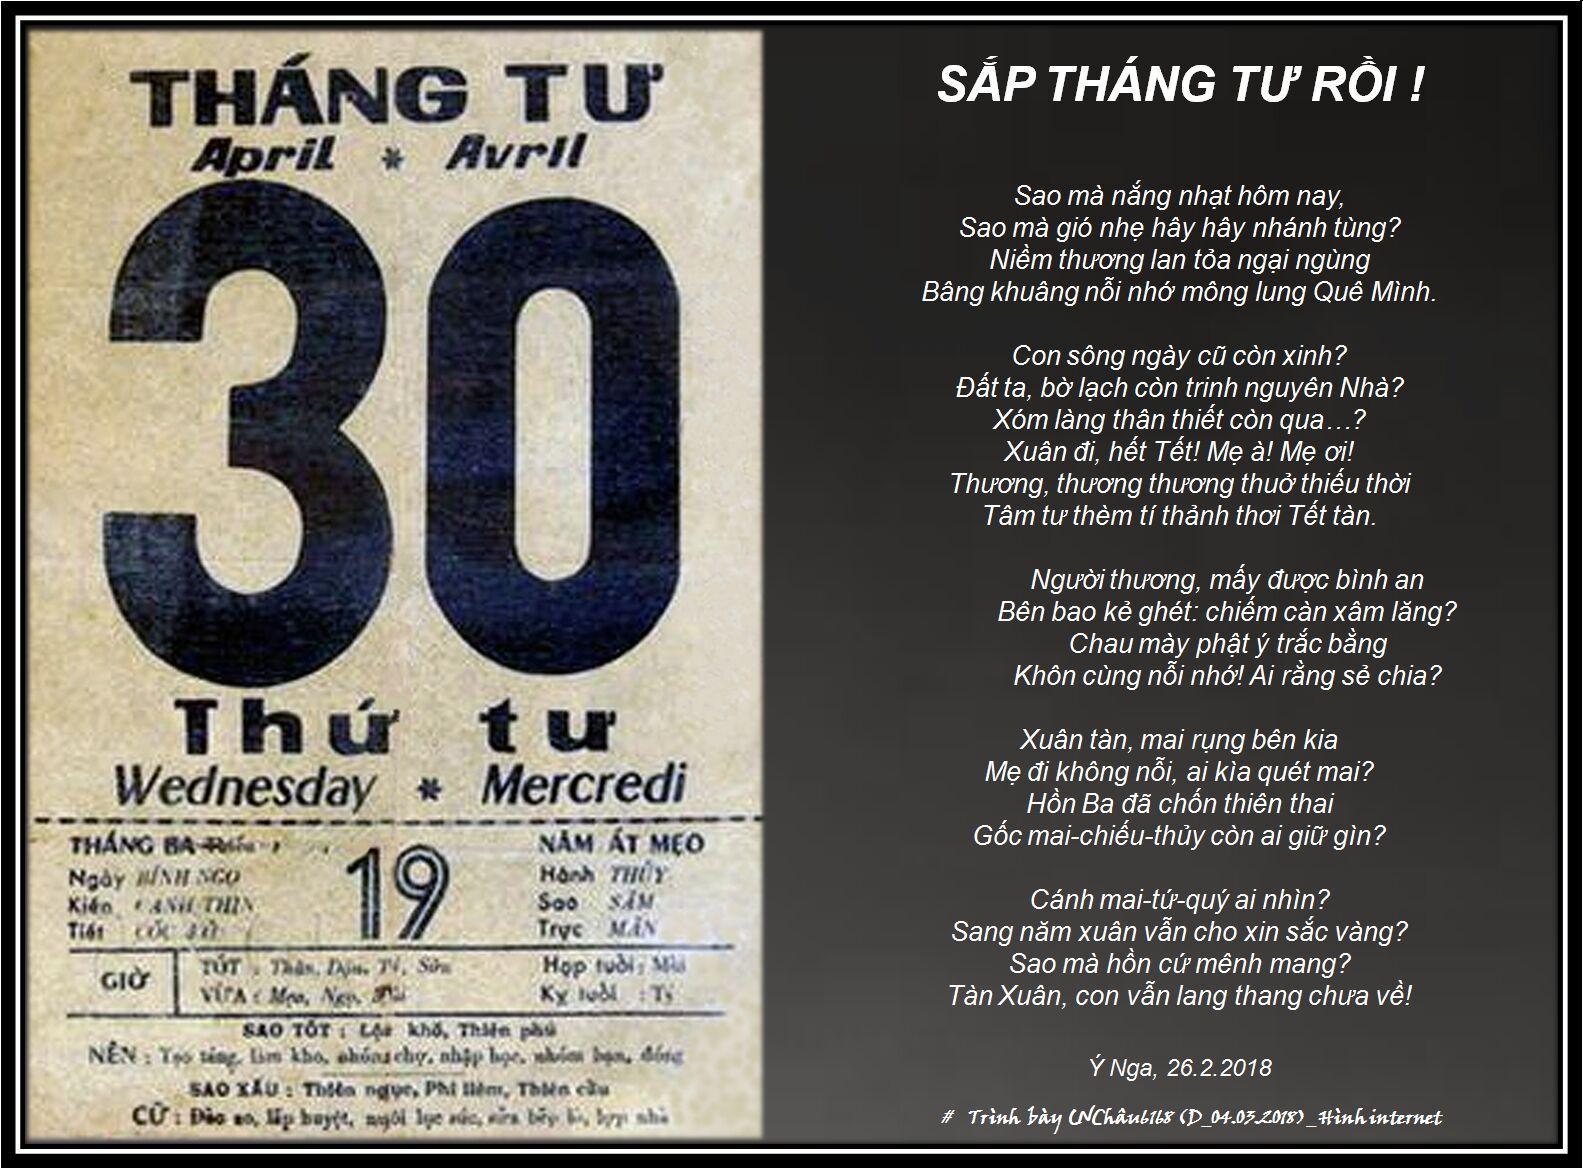 E:\Layout Tho+ Tranh\Tranh tho+ SapTháng4Roi (YNga)_Layout by Chau6168.jpg